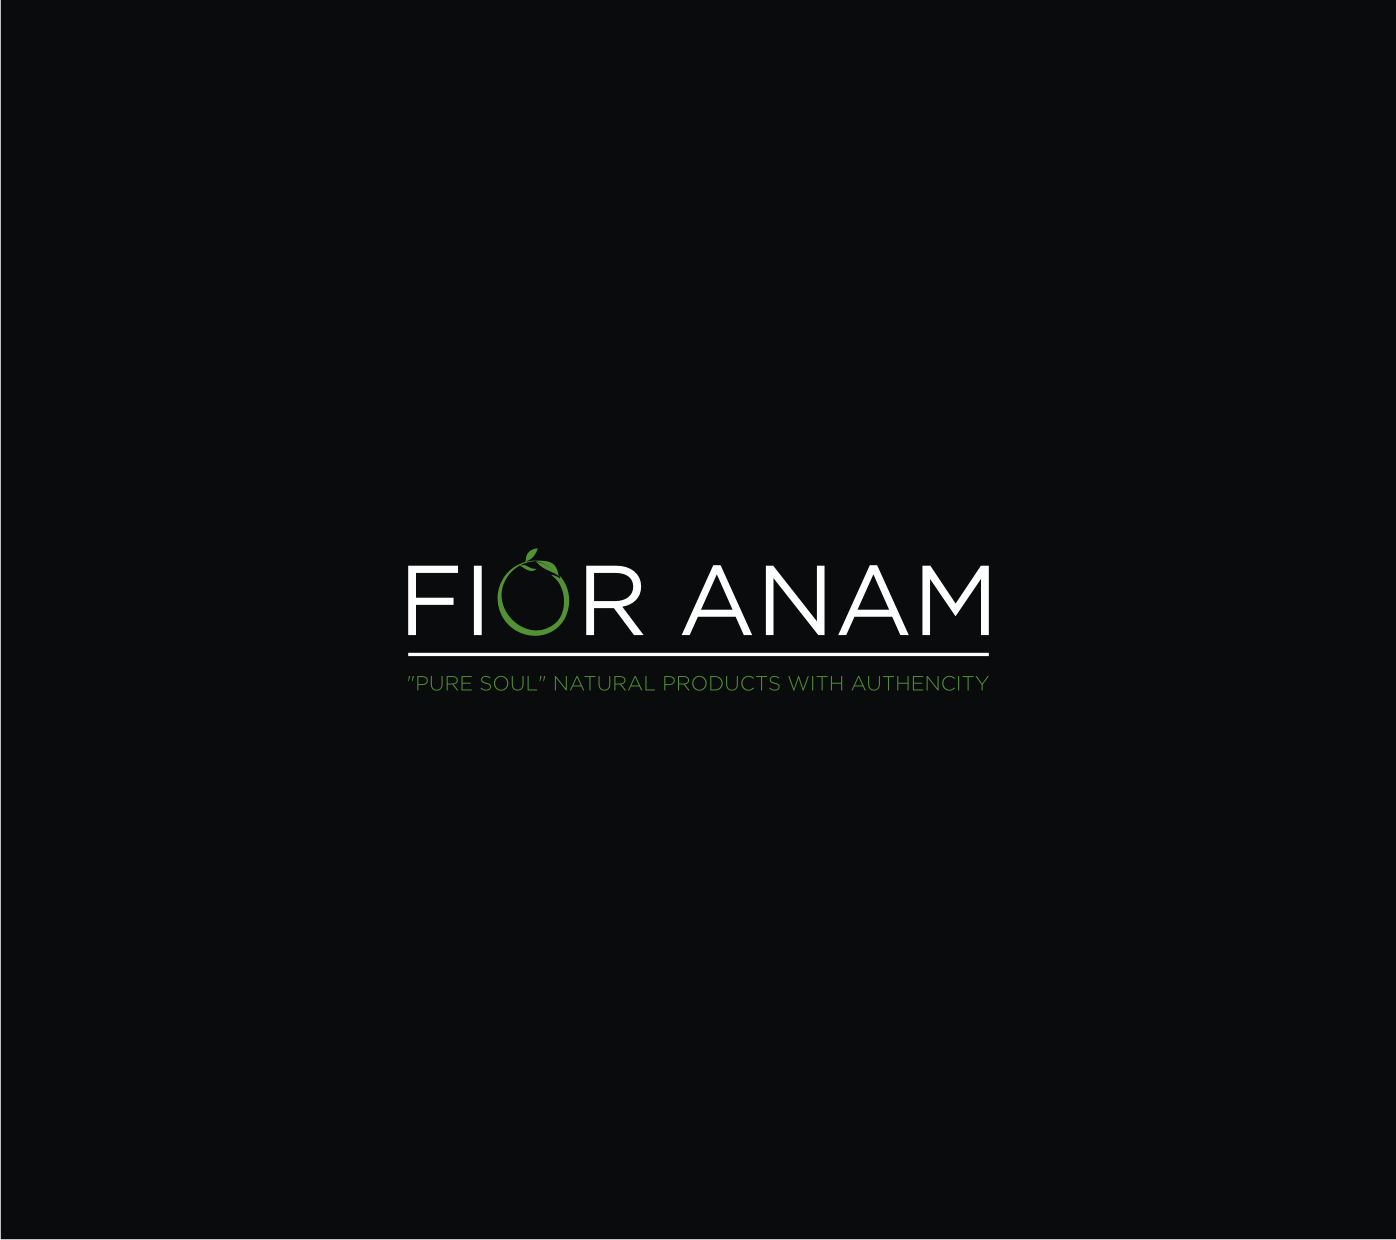 Logo Design by Sigitumarali Sigit - Entry No. 7 in the Logo Design Contest Creative Logo Design for Fior Anam.